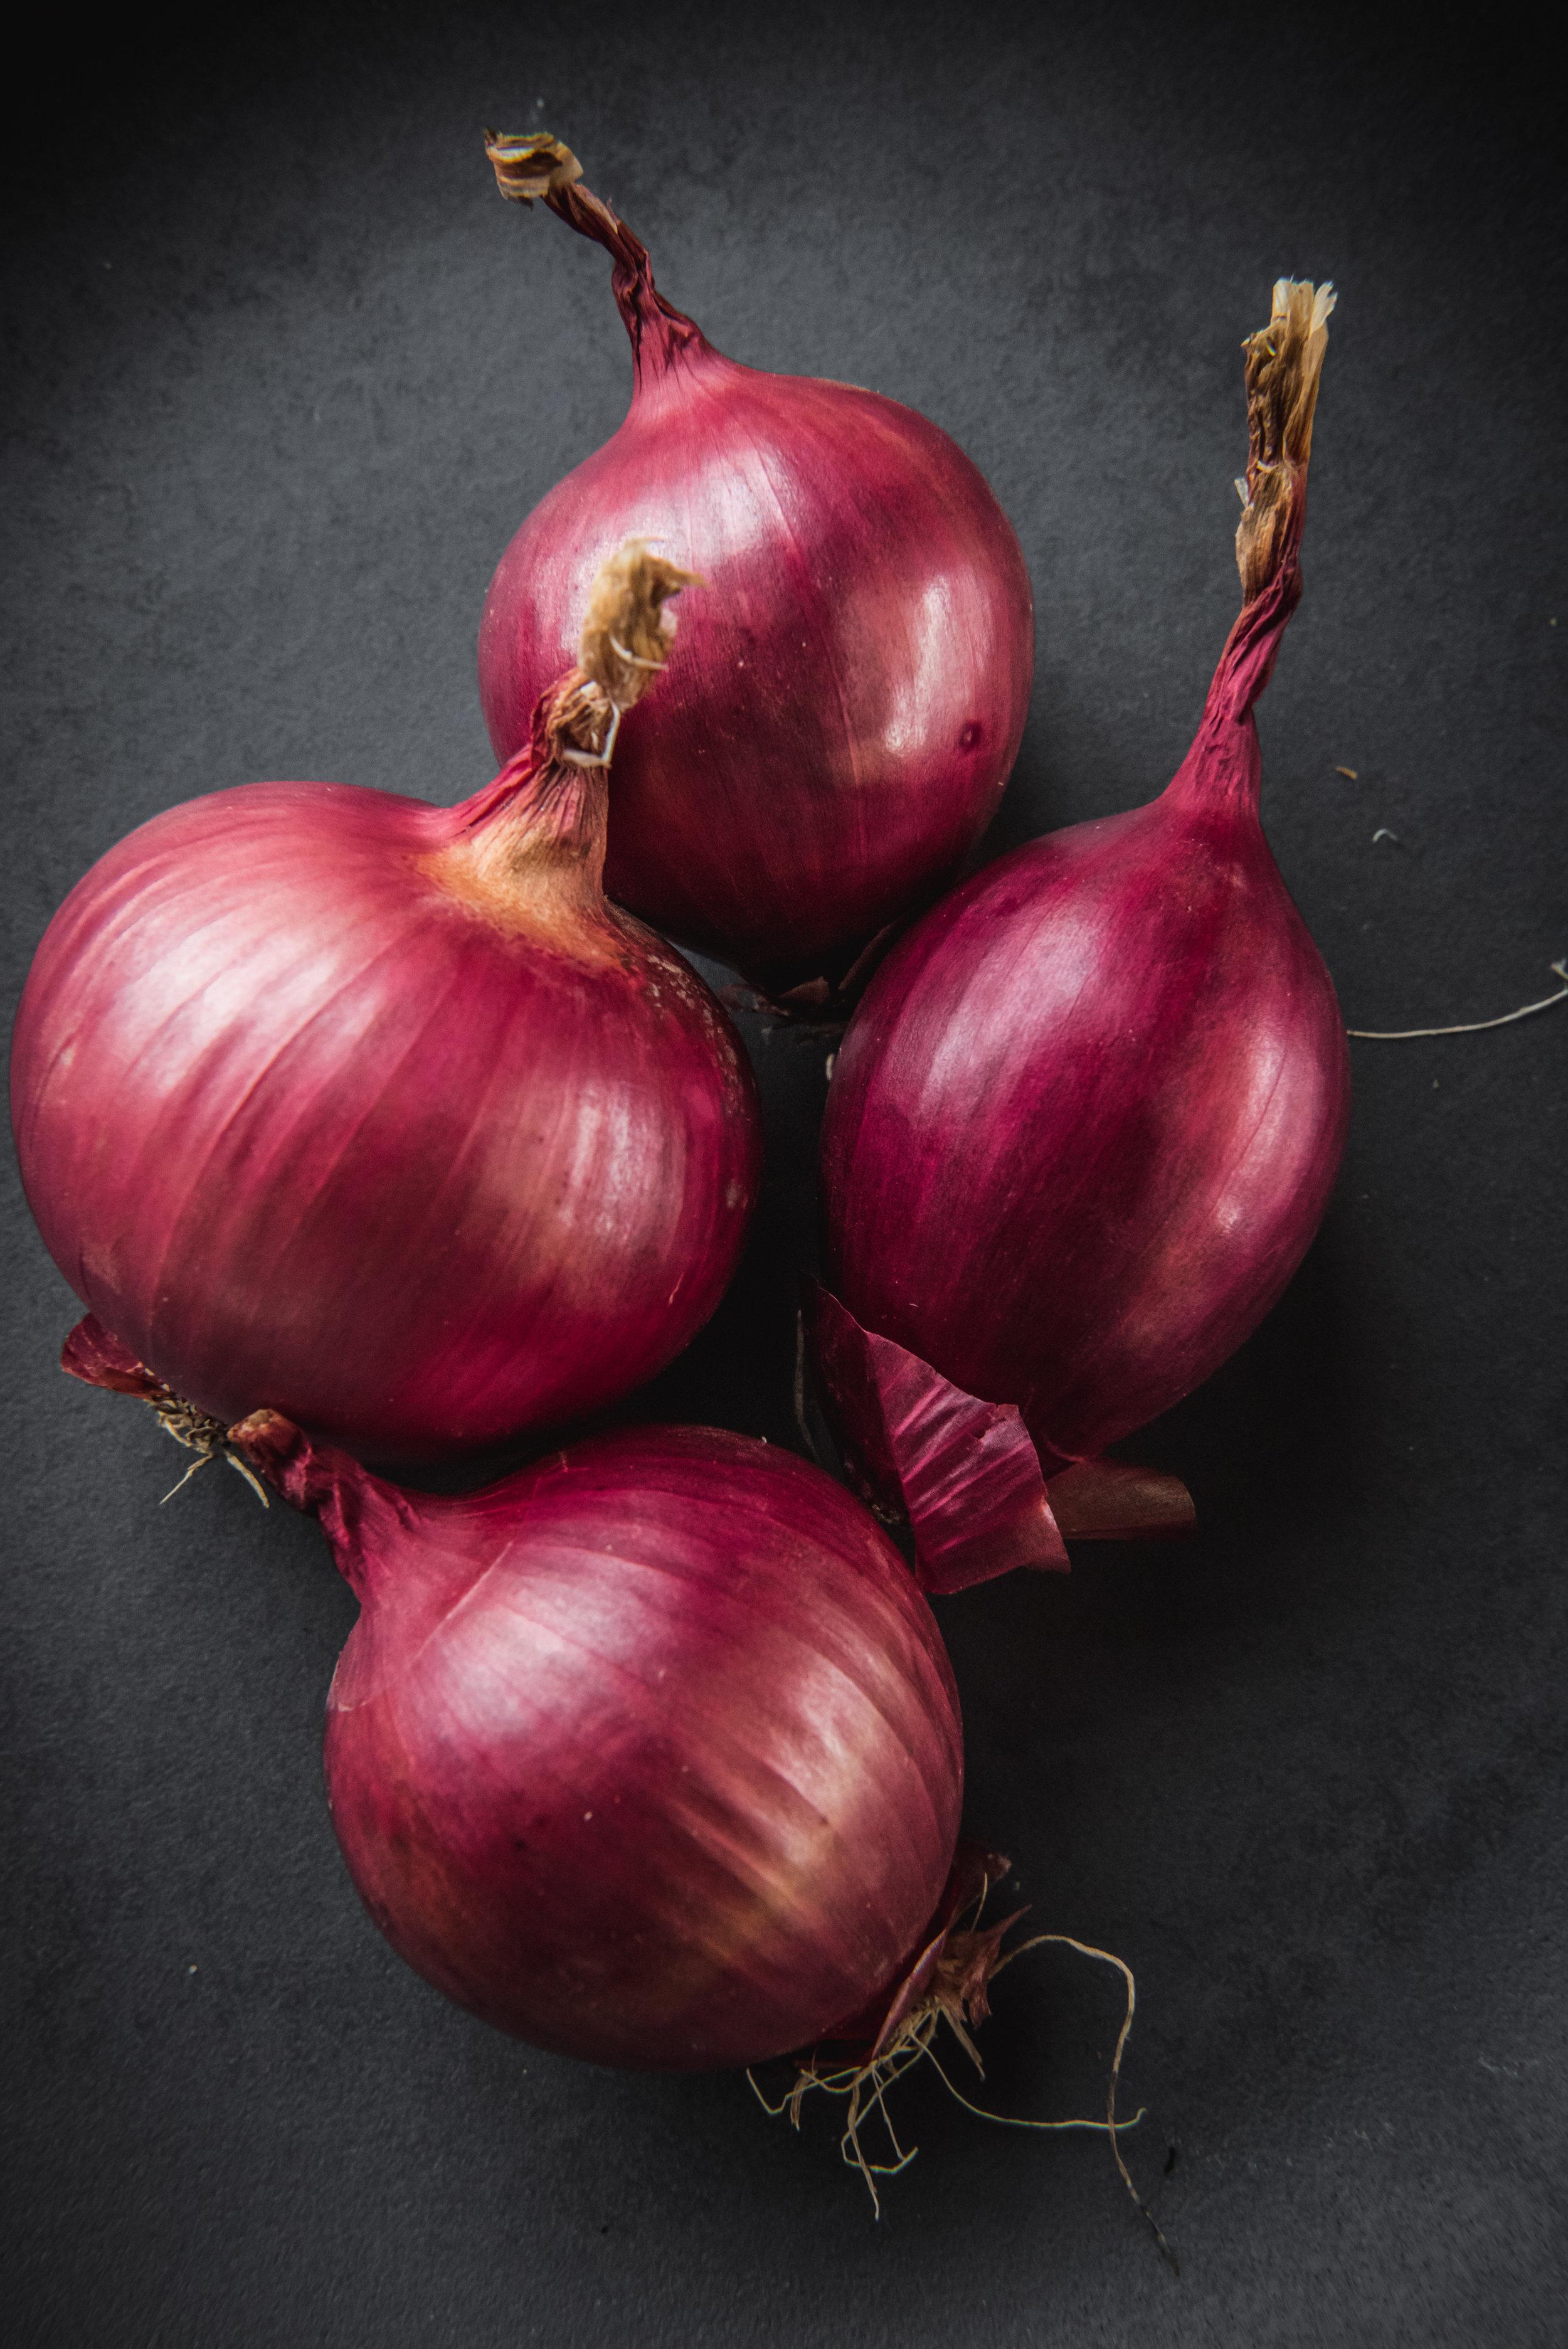 Zohlrabi? nope! red onions…